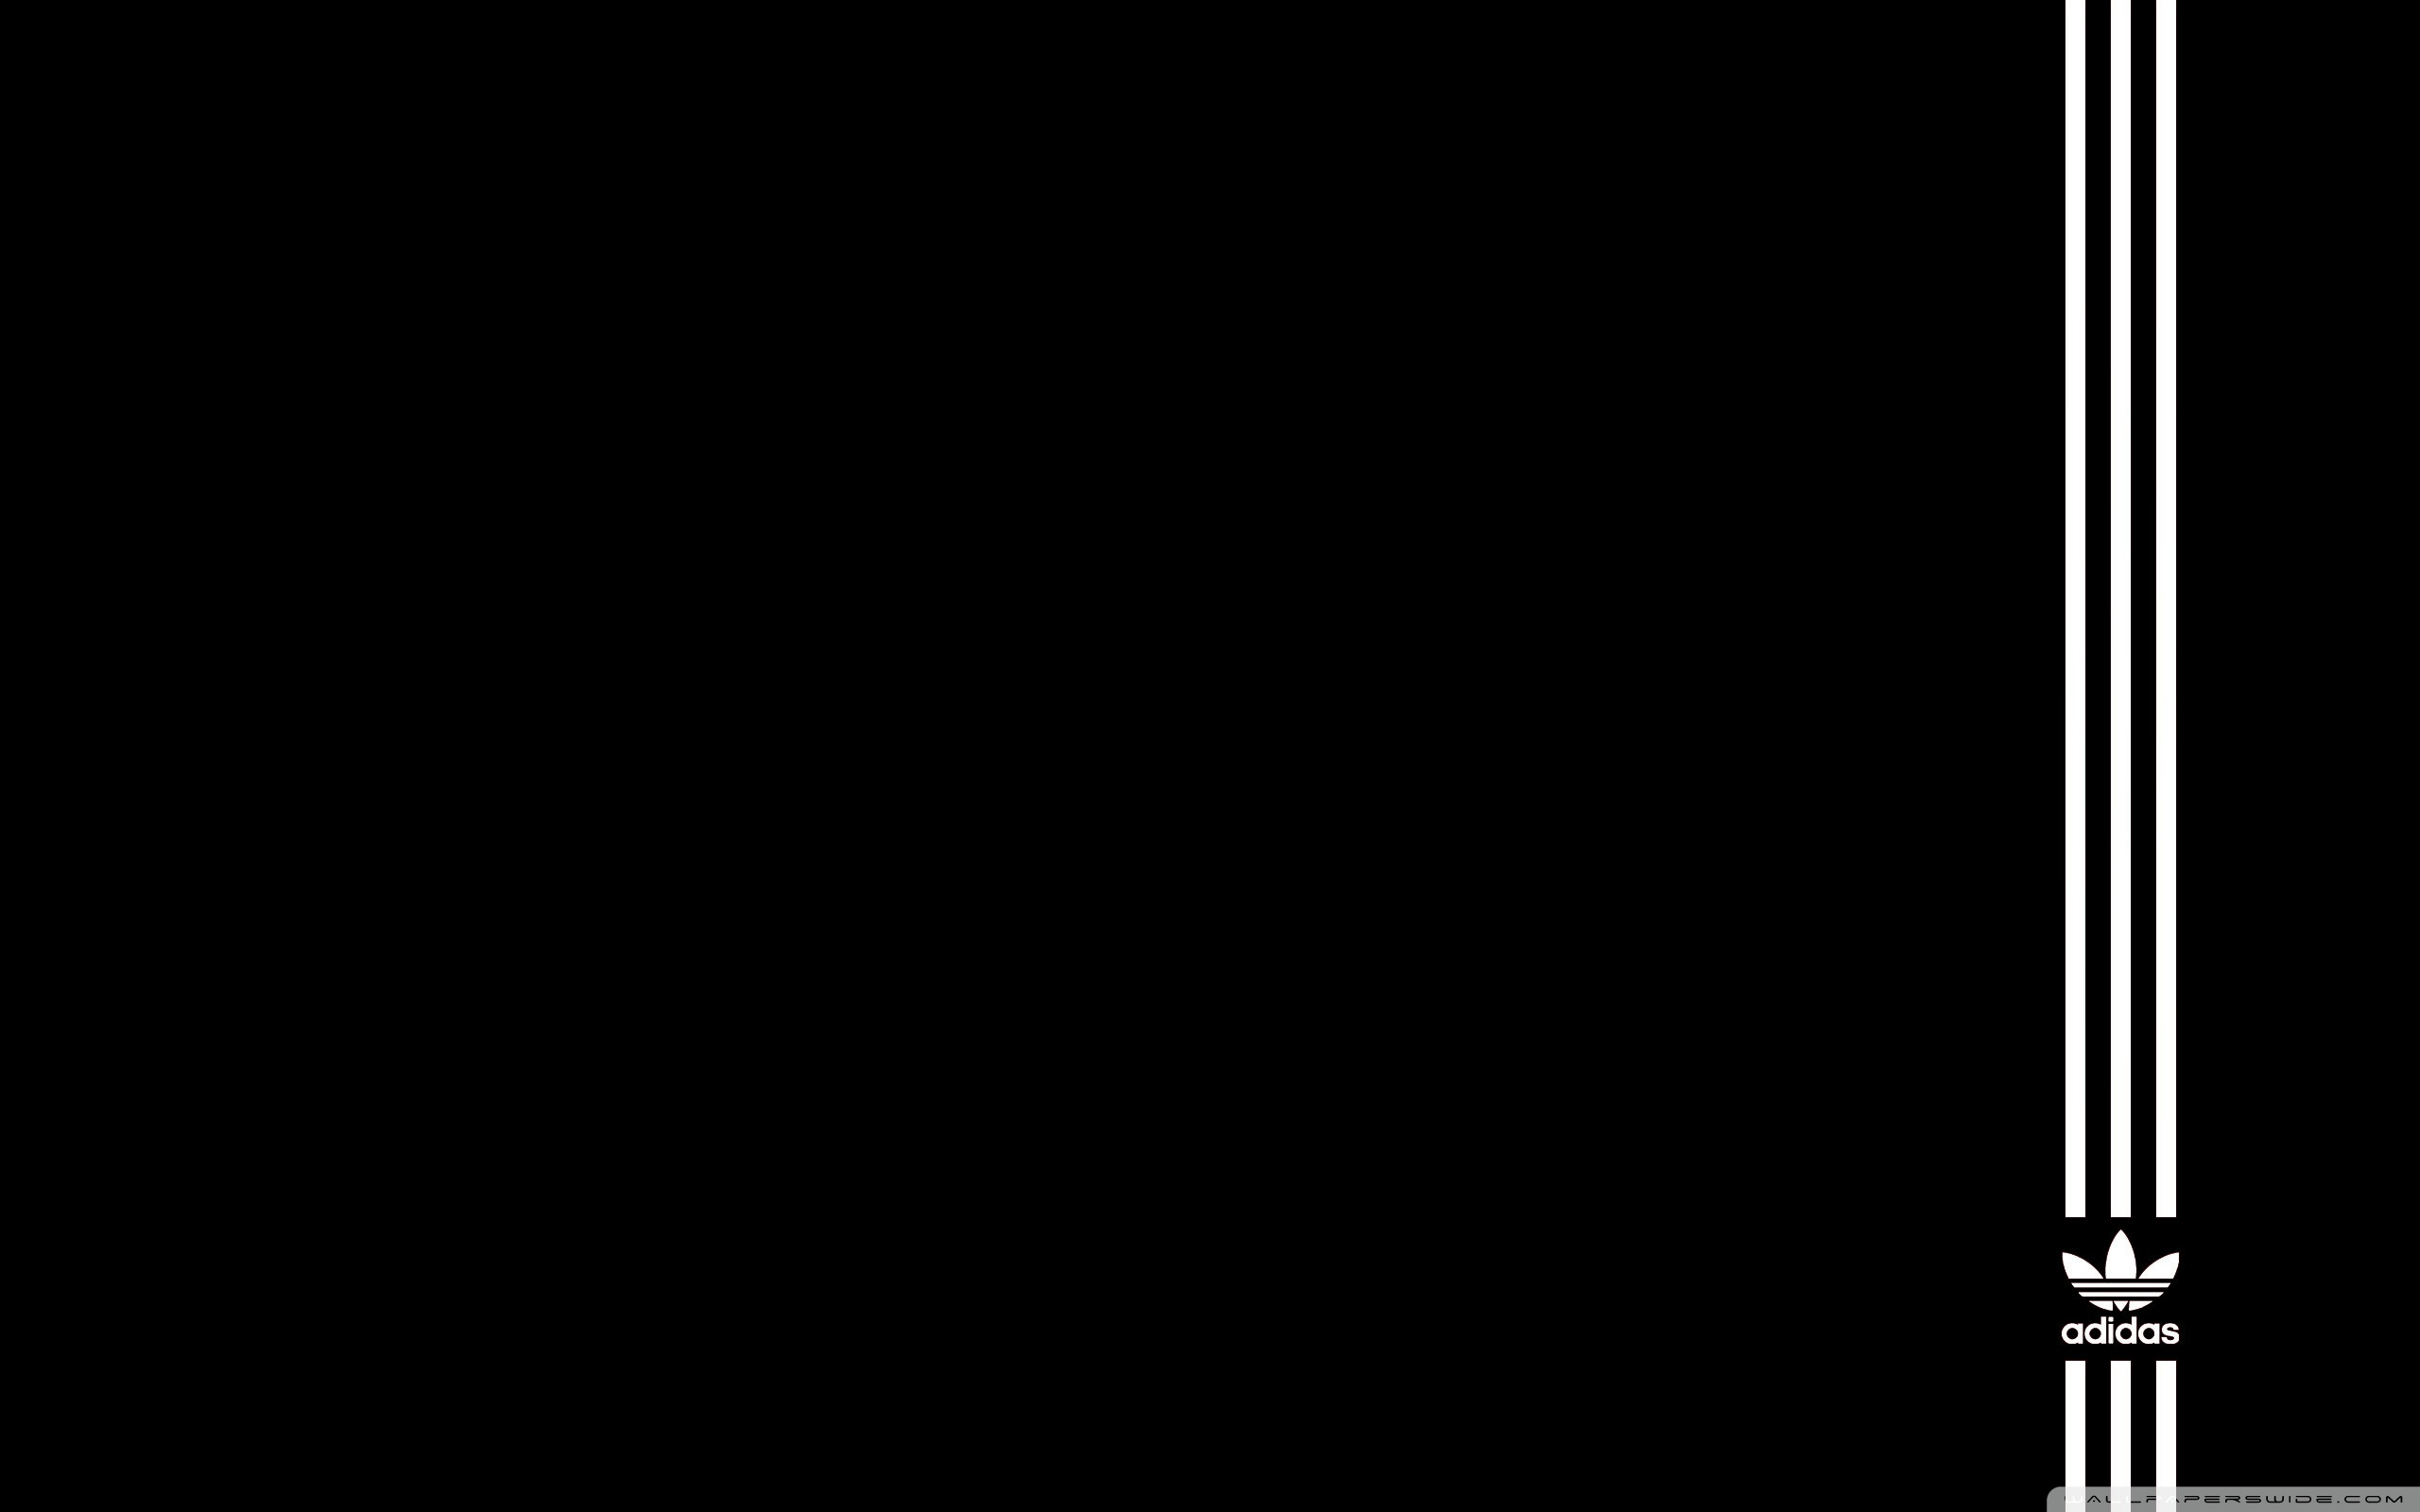 black background wallpaper 2560x1600 - photo #3